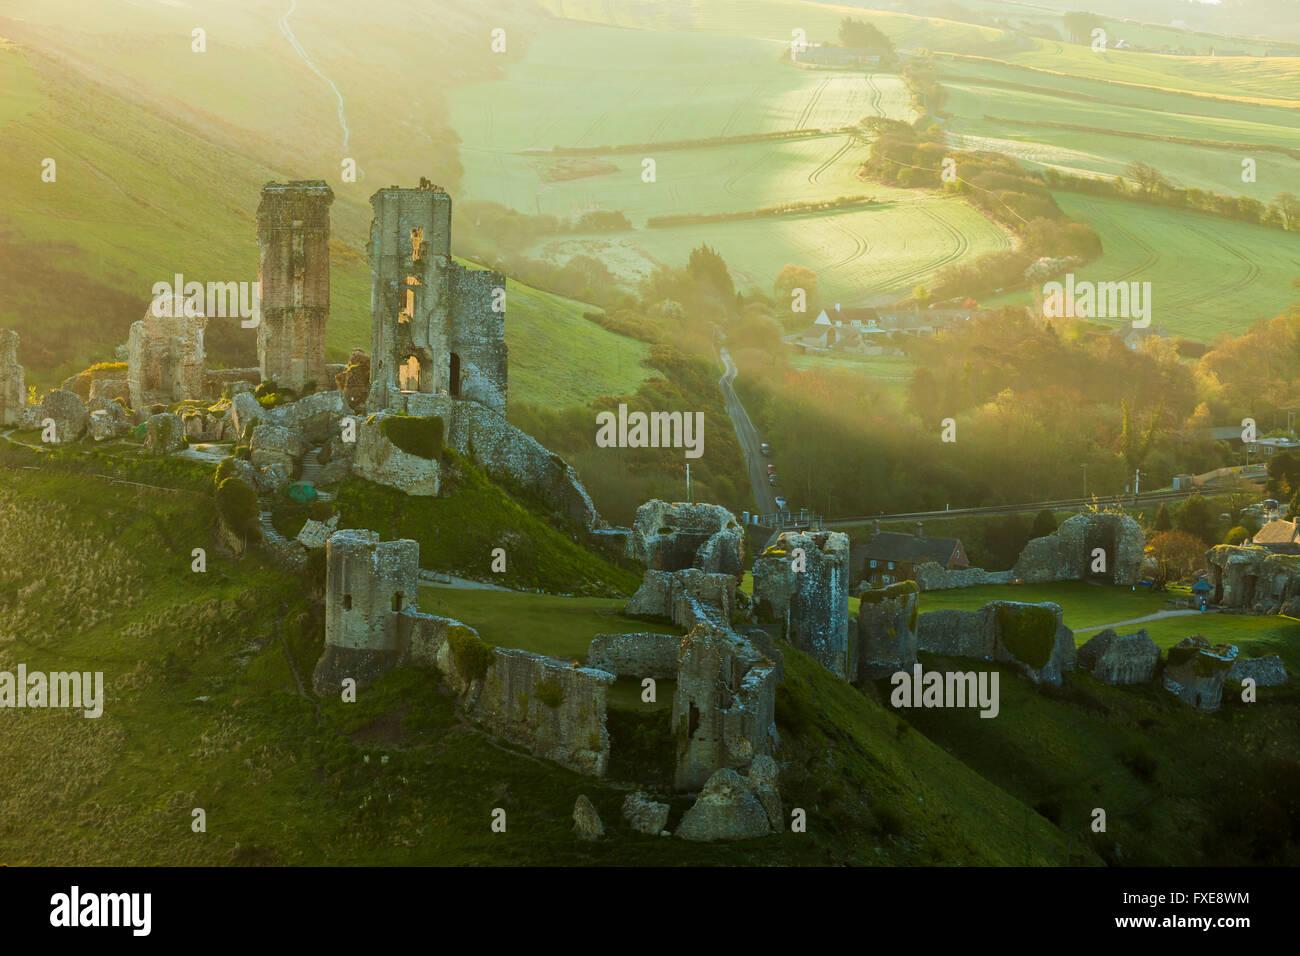 Corfe Castle, Dorset, England. - Stock Image